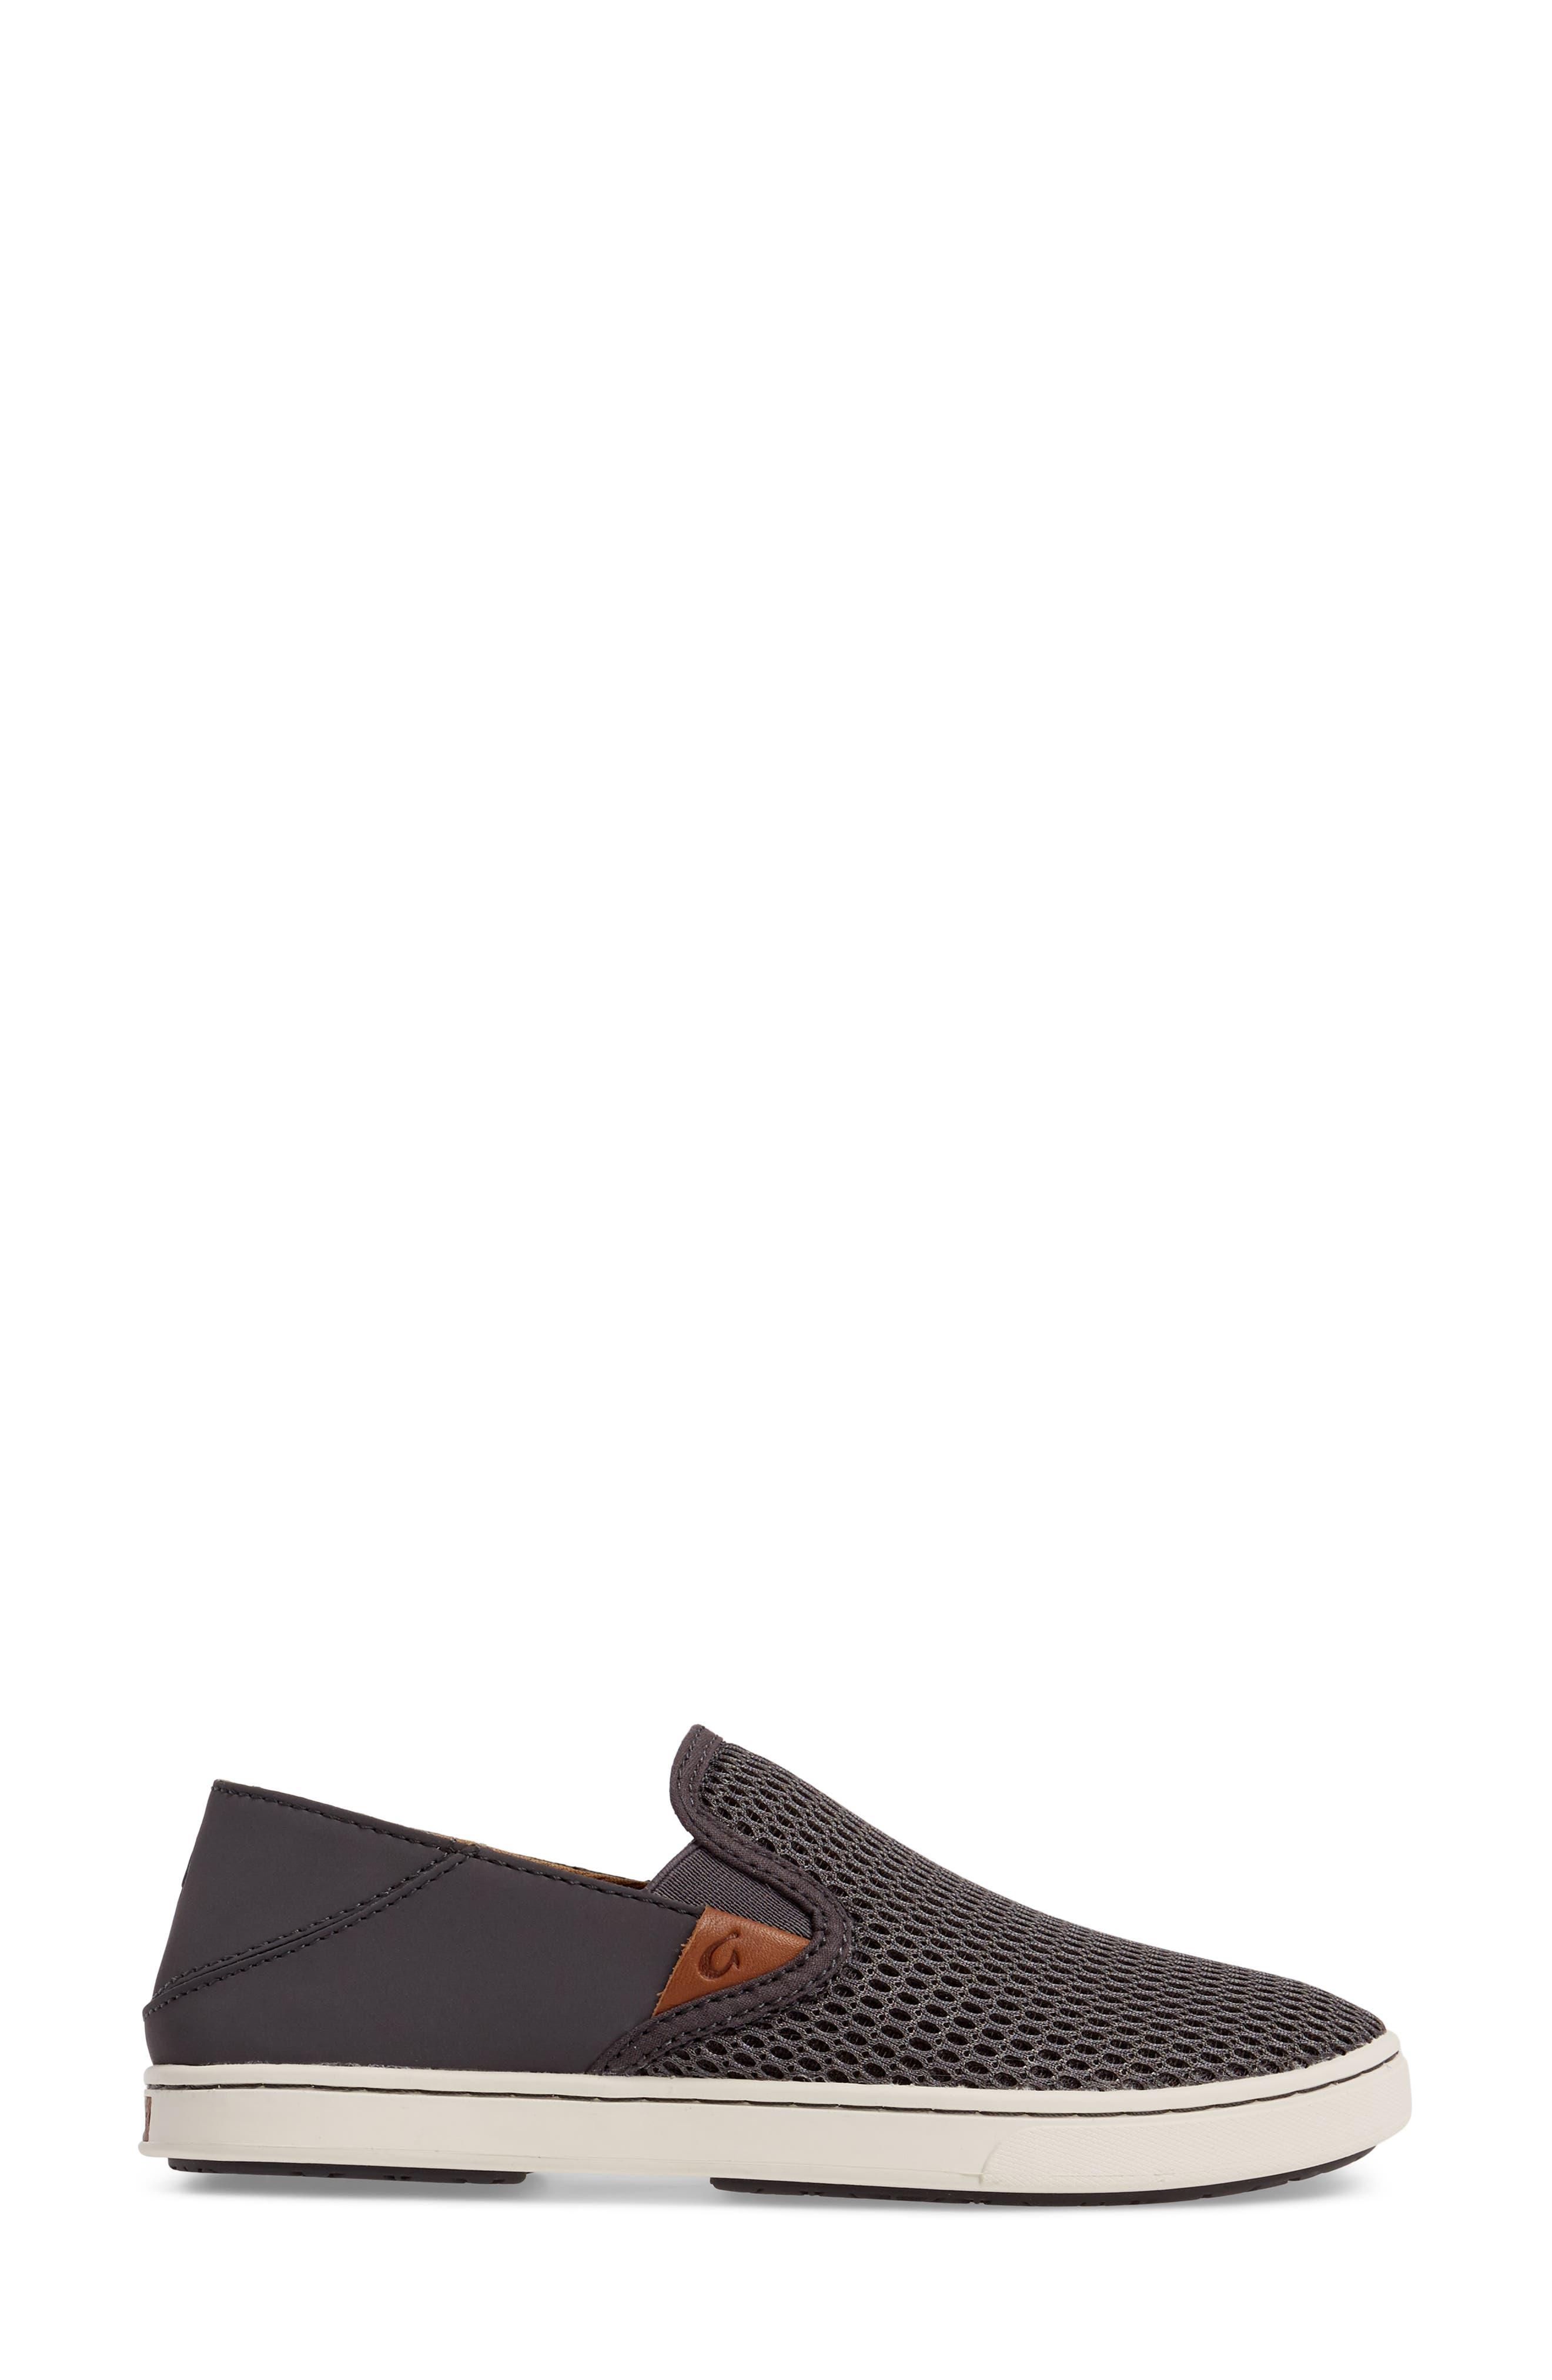 'Pehuea' Slip-On Sneaker,                             Alternate thumbnail 3, color,                             PAVEMENT/ PAVEMENT FABRIC